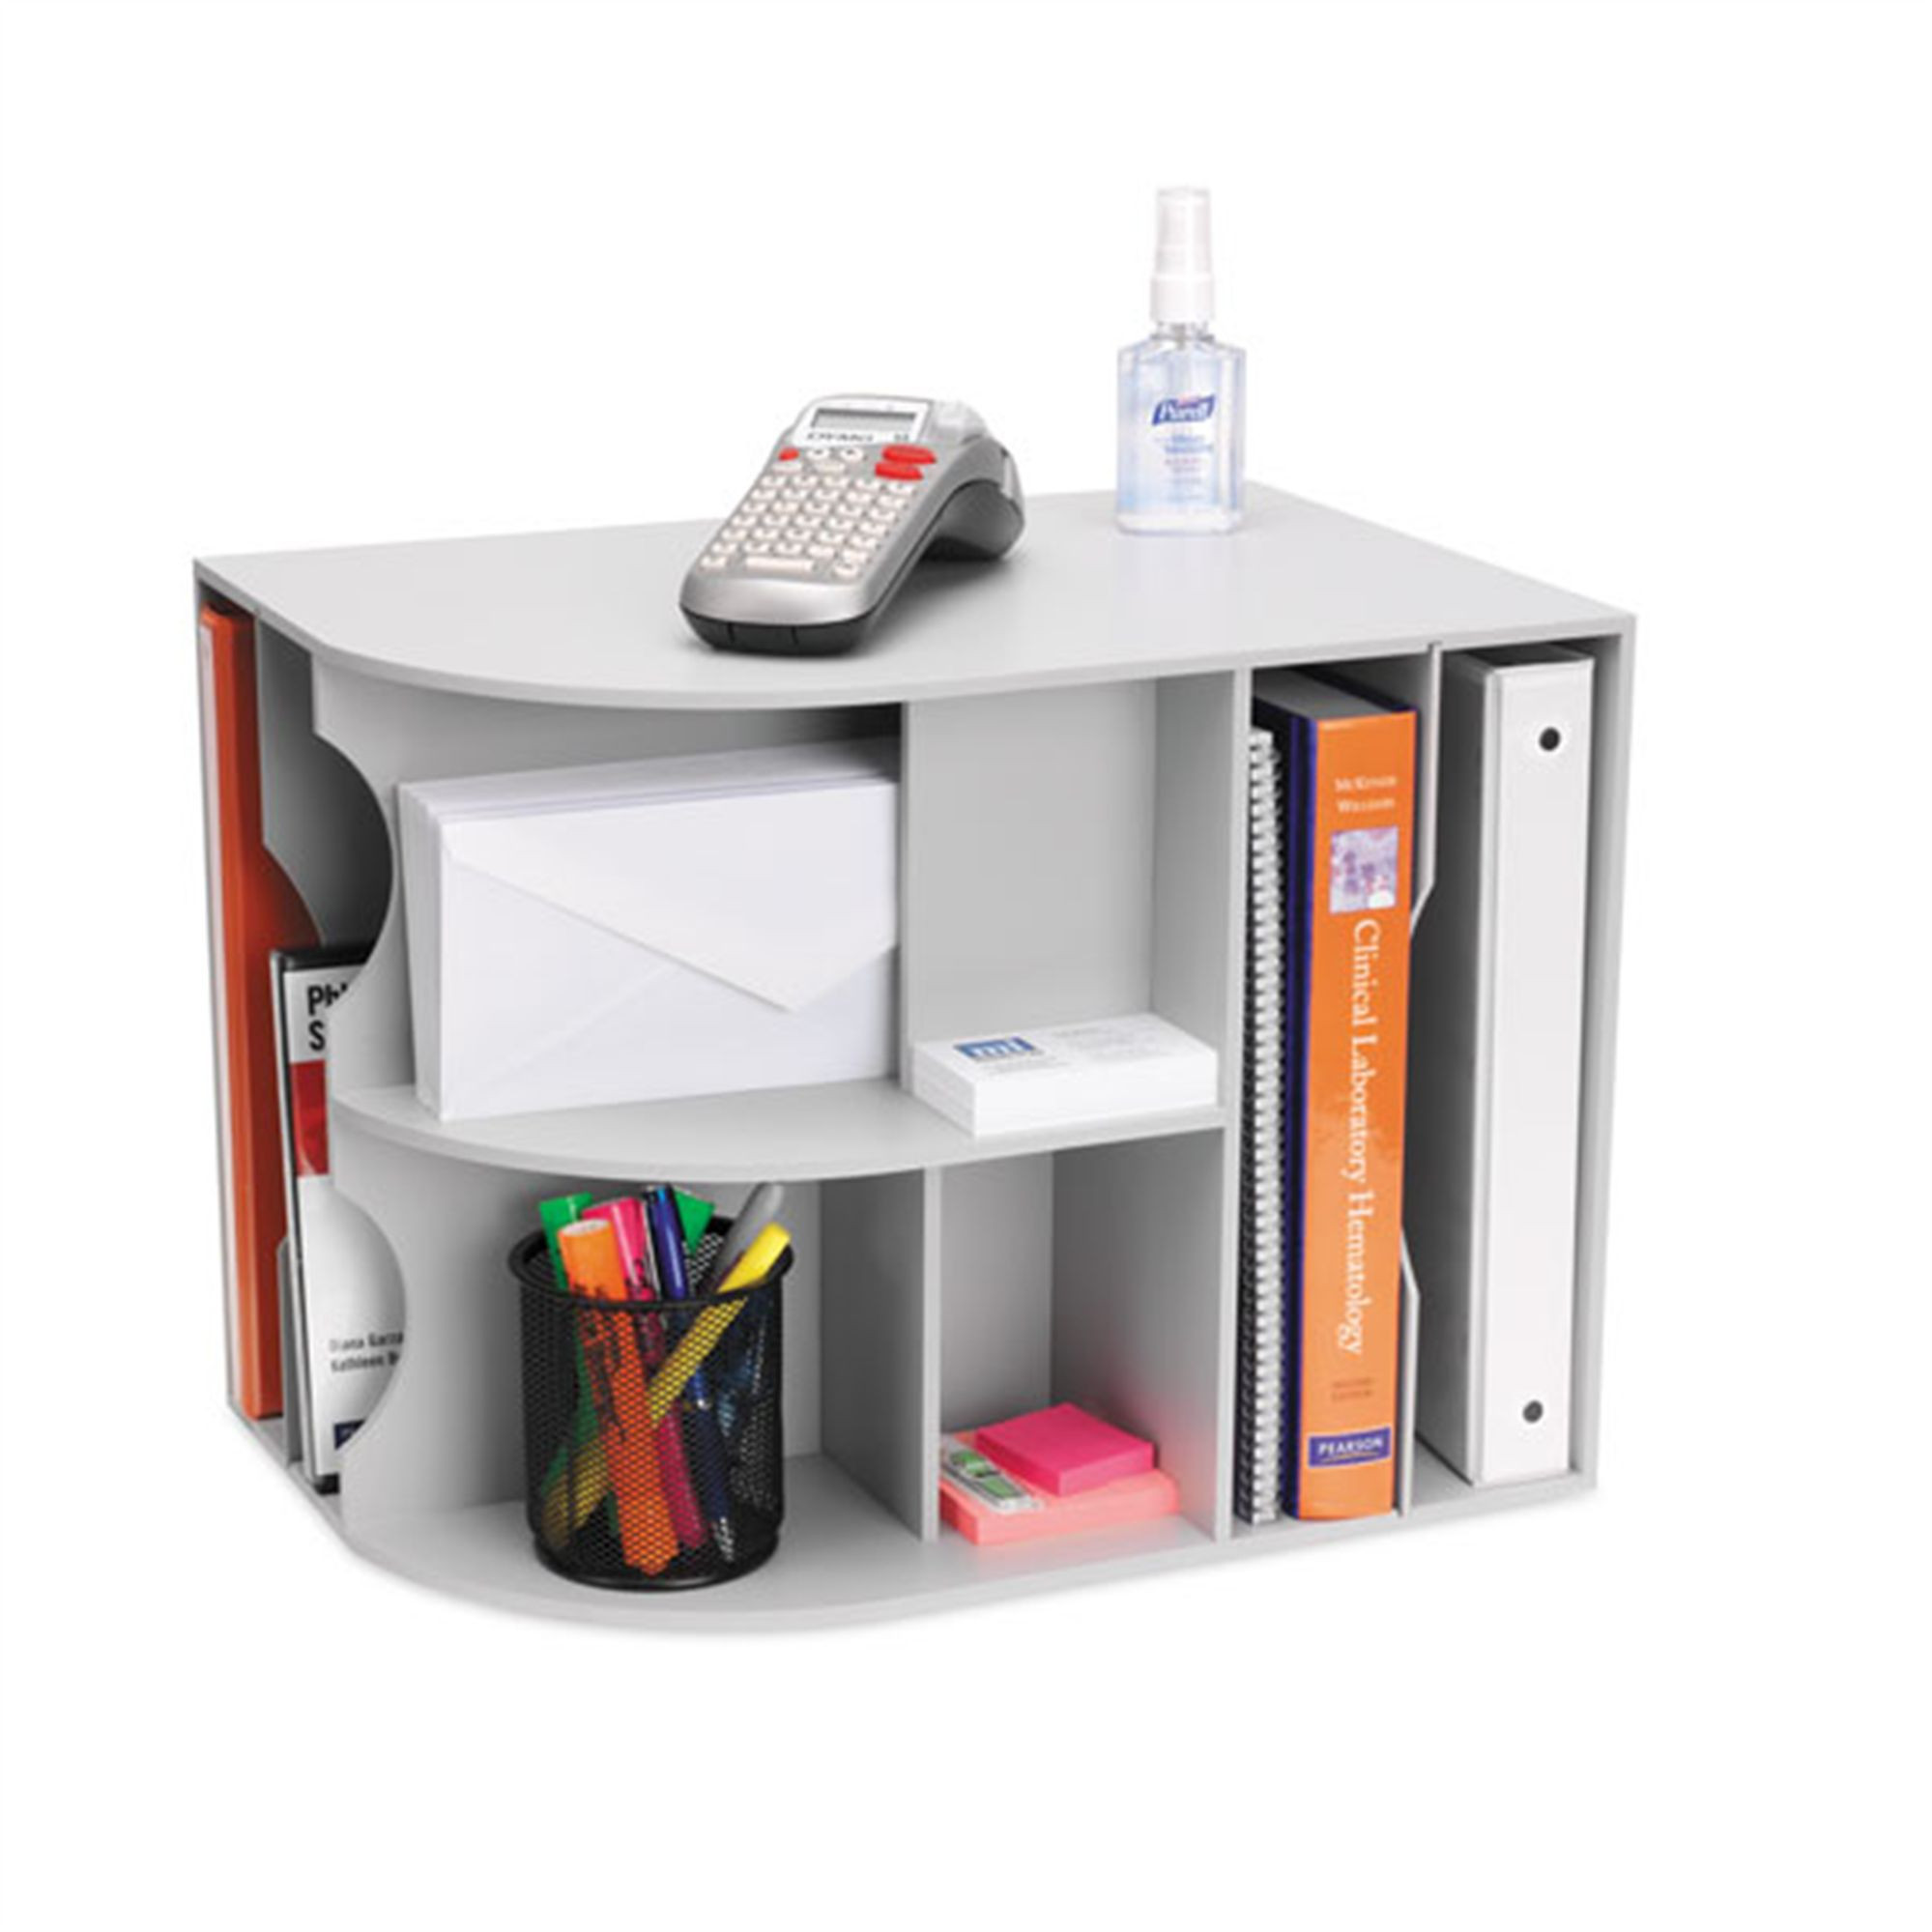 Desk Top Organizer  3 Way Desktop Organizer MarketLab Inc